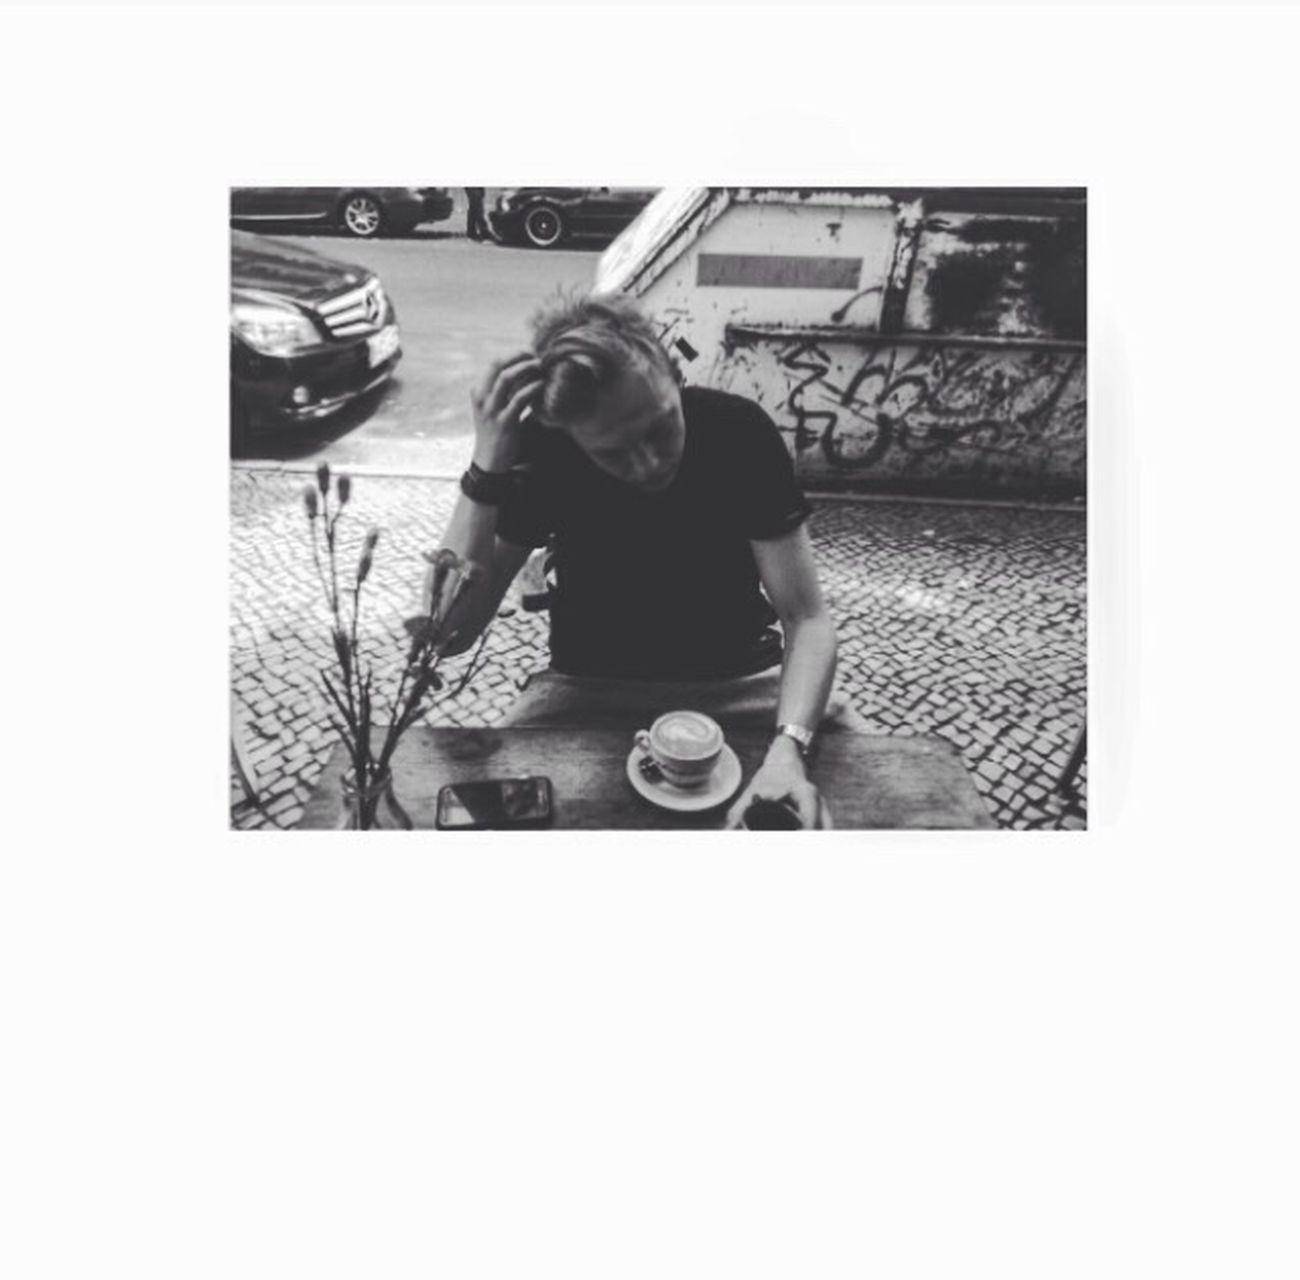 Good #morning Good #life Cafe Harmonie Noworries